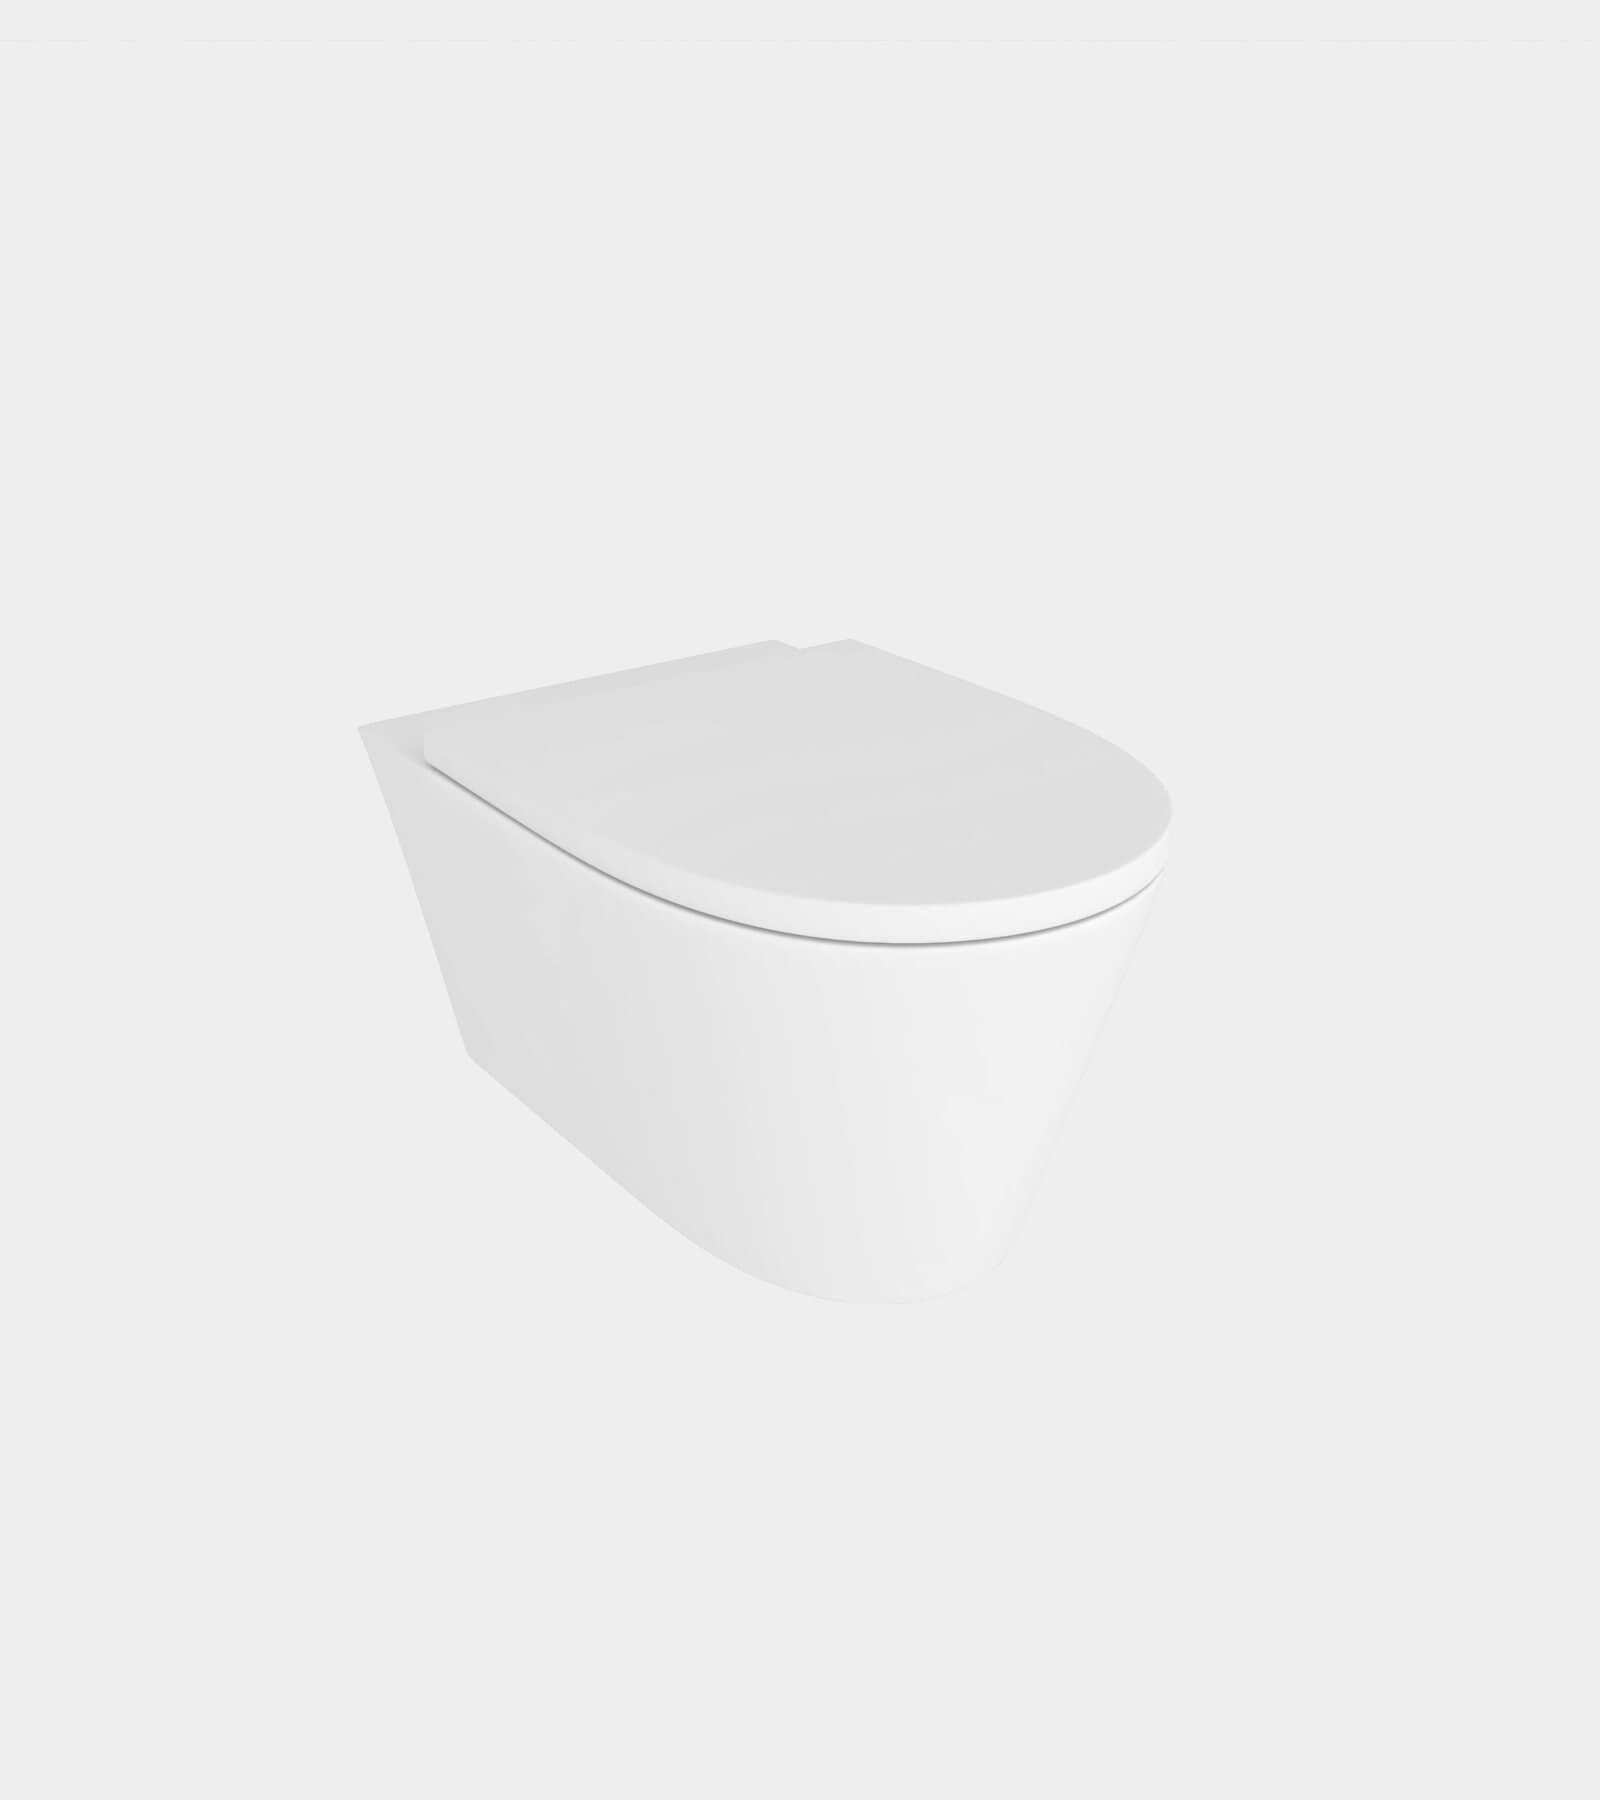 Wall mounted wc pan - 3D Model